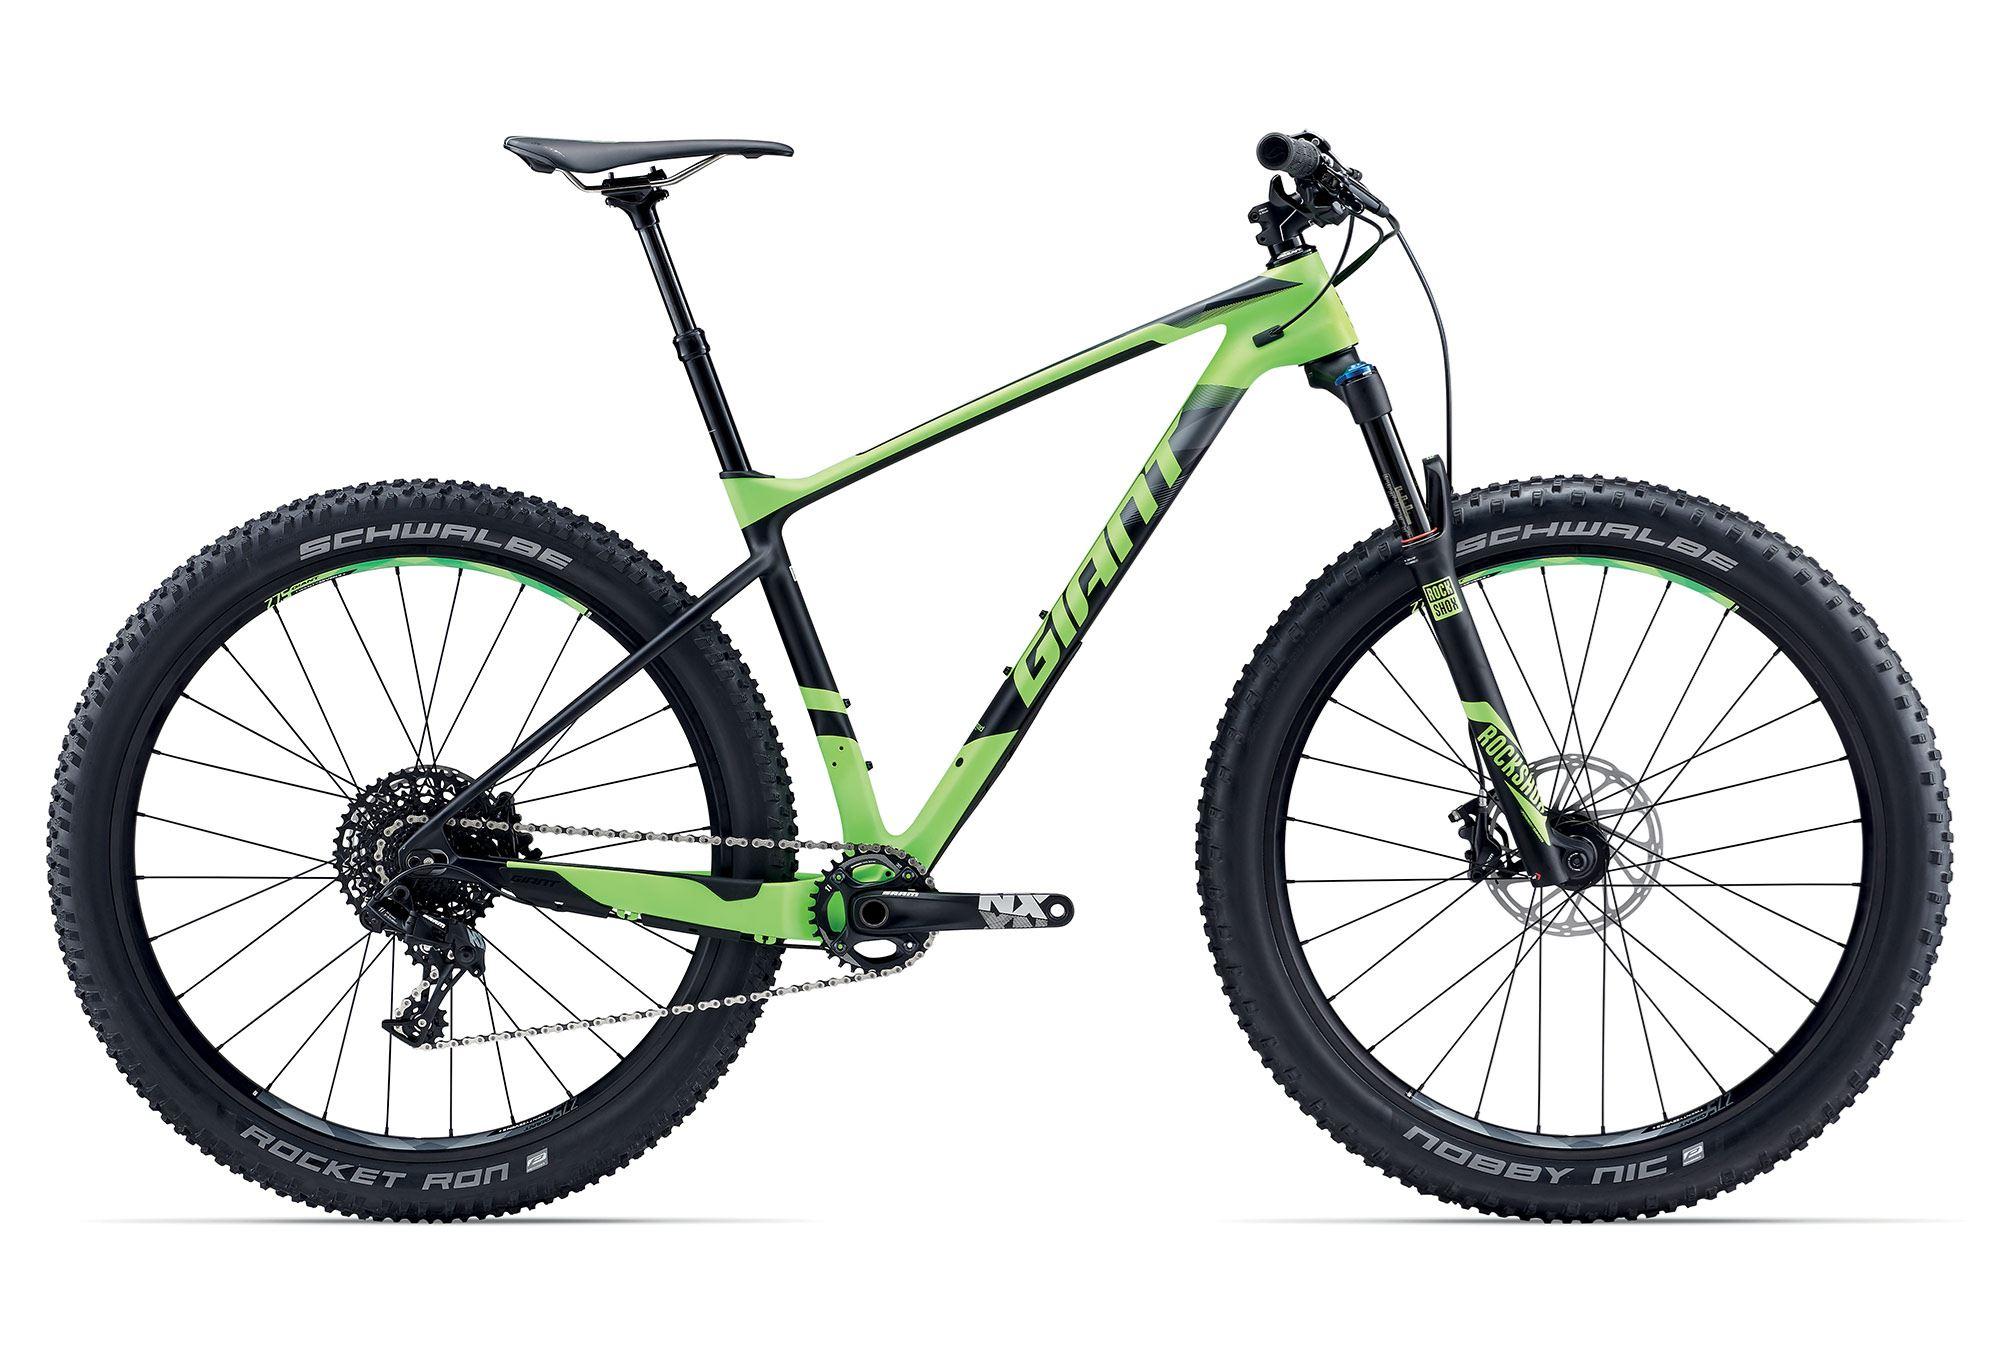 2017 Giant XTC Advanced +2 £2299